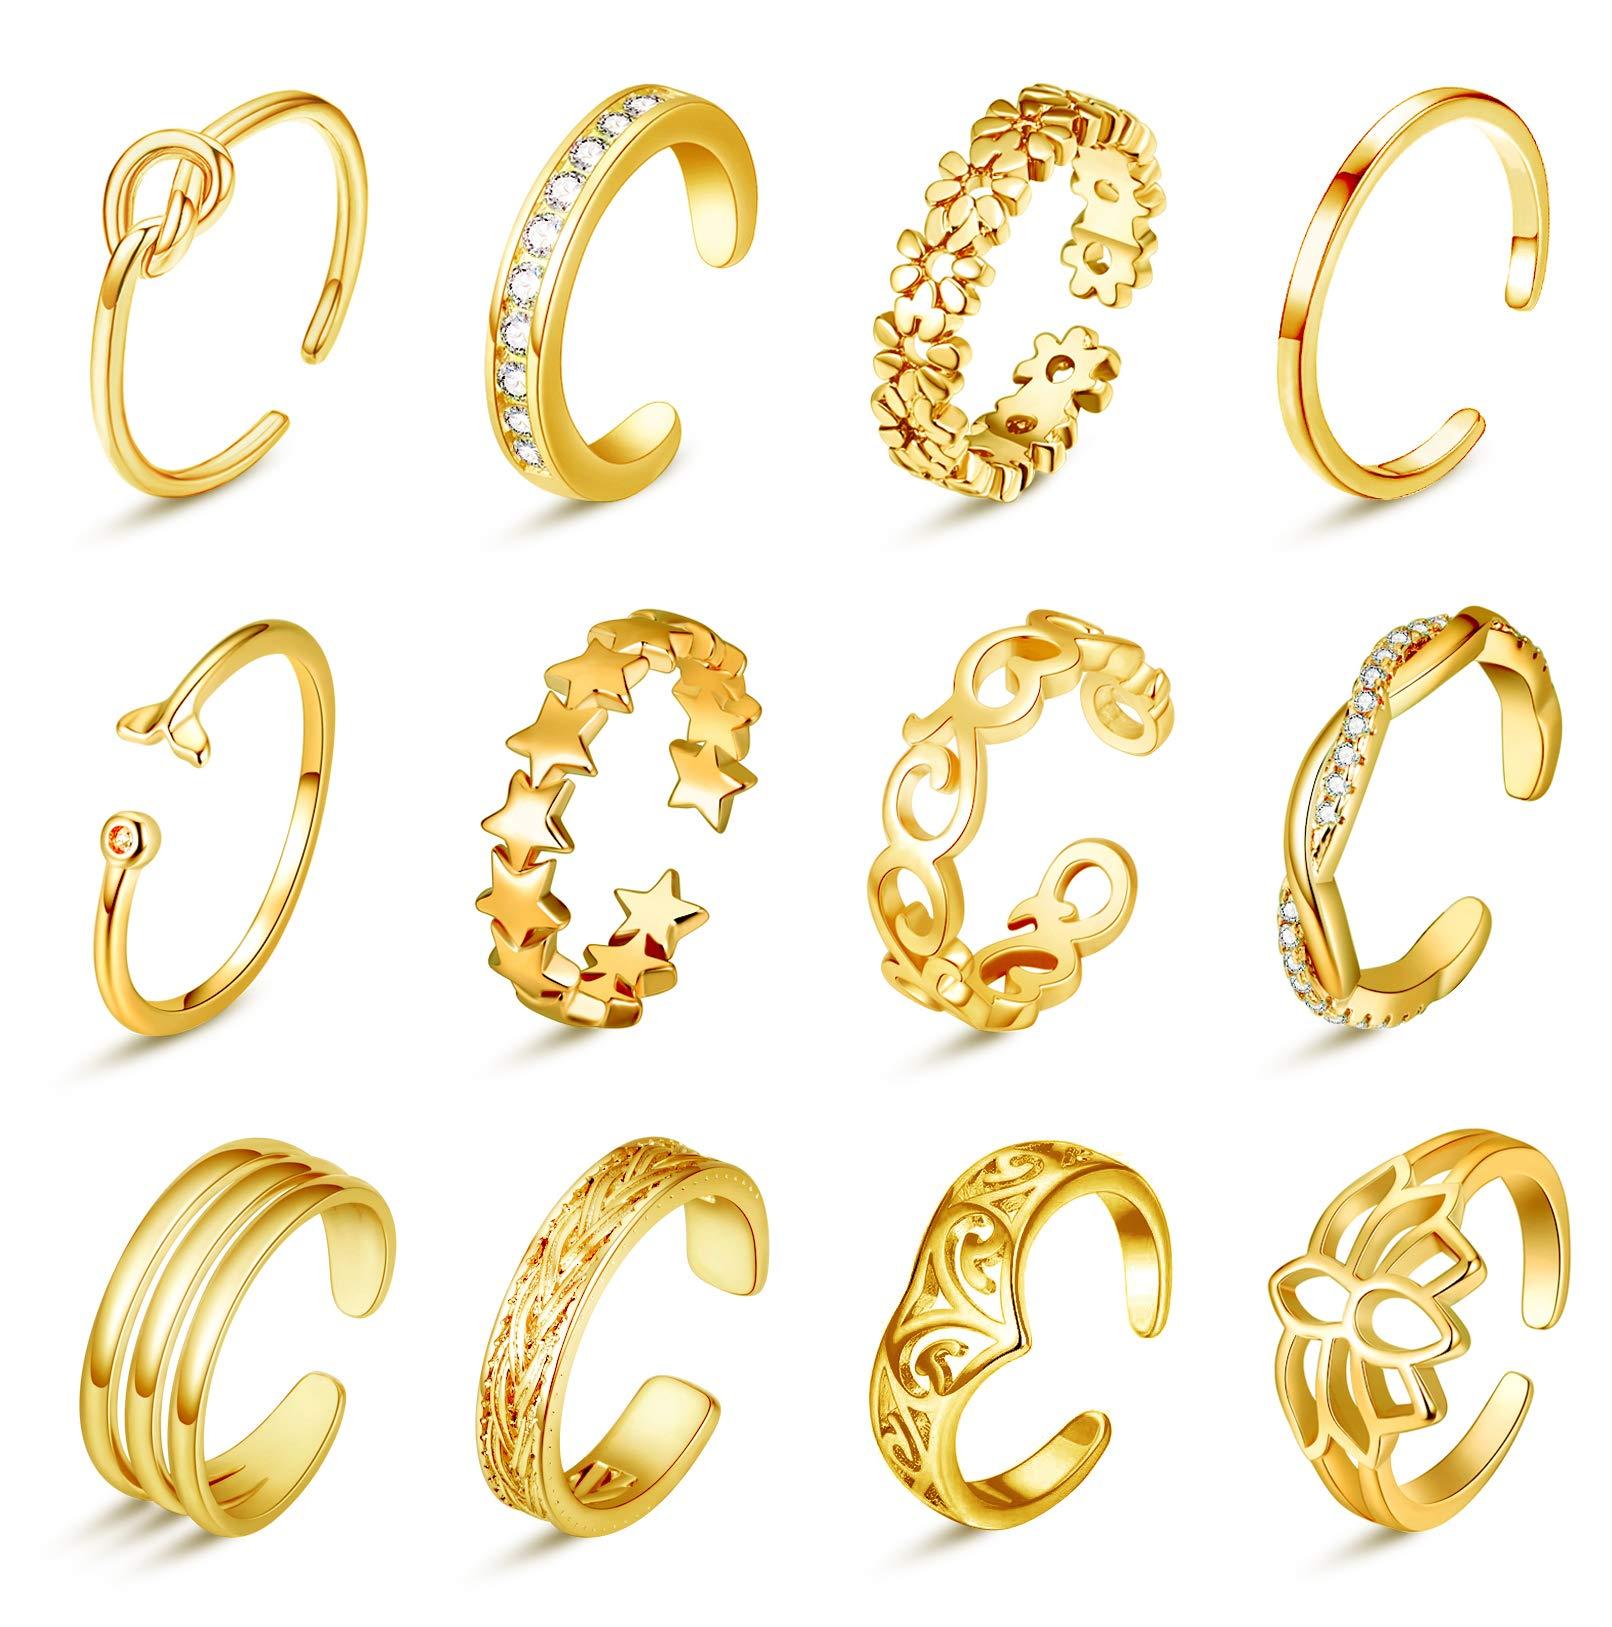 Honsny 12PCS Adjustable Toe Rings for Women Hypoallergenic Open Tail Ring Set Summer Beach Body Feet Jewelry